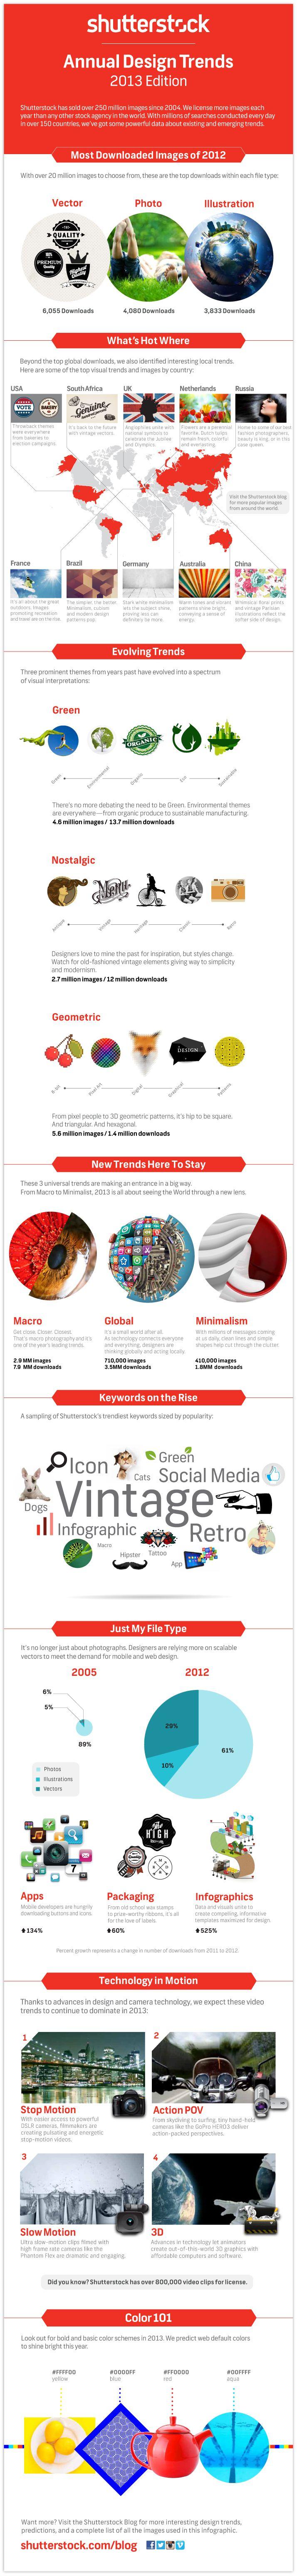 Shutterstock's Global Design Trends Infographic 2013